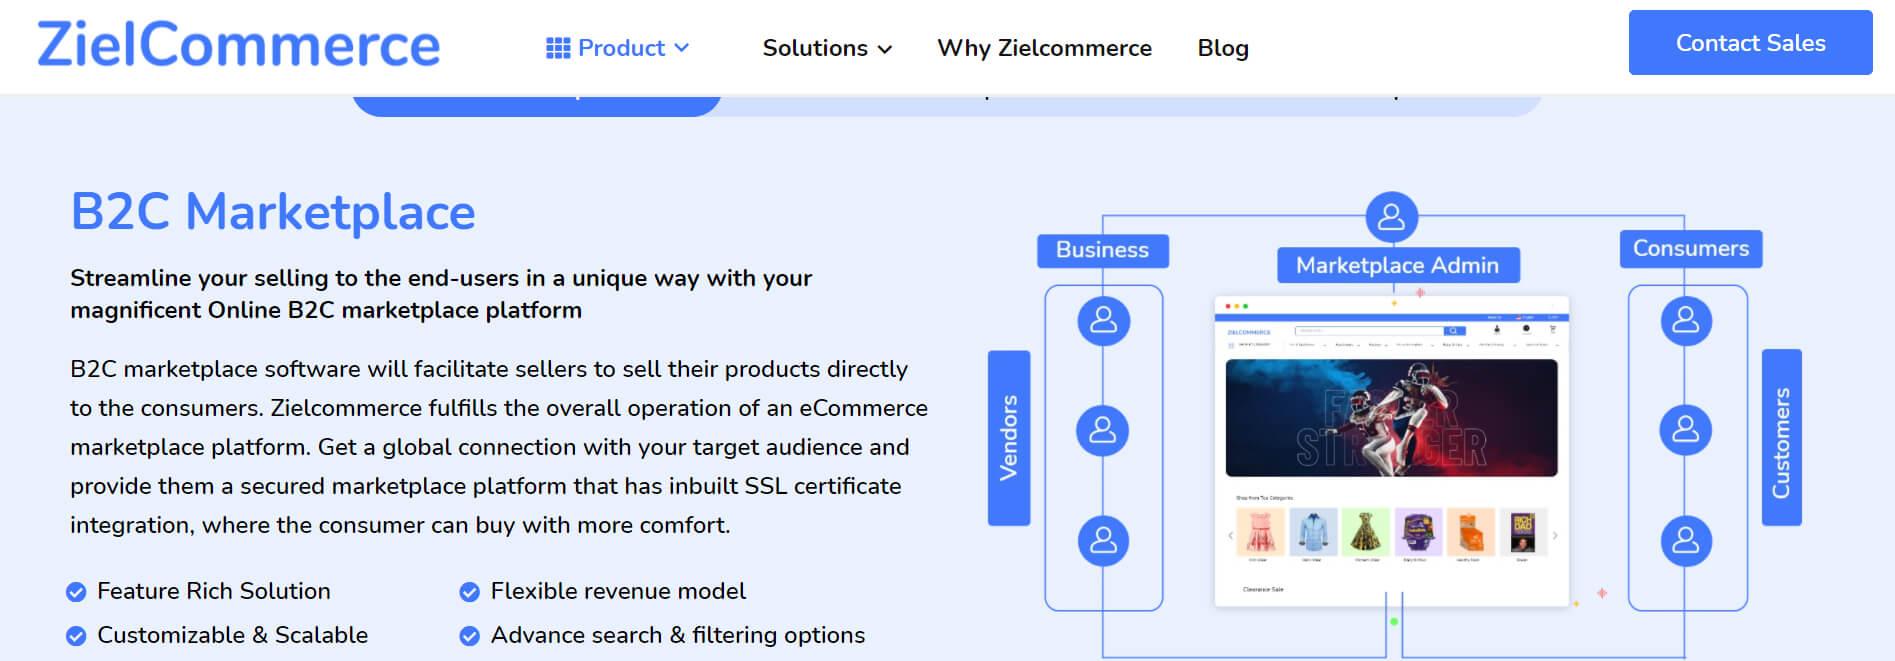 Zielcommerce Ready-To-Go Multi Vendor eCommerce Marketplace Platform